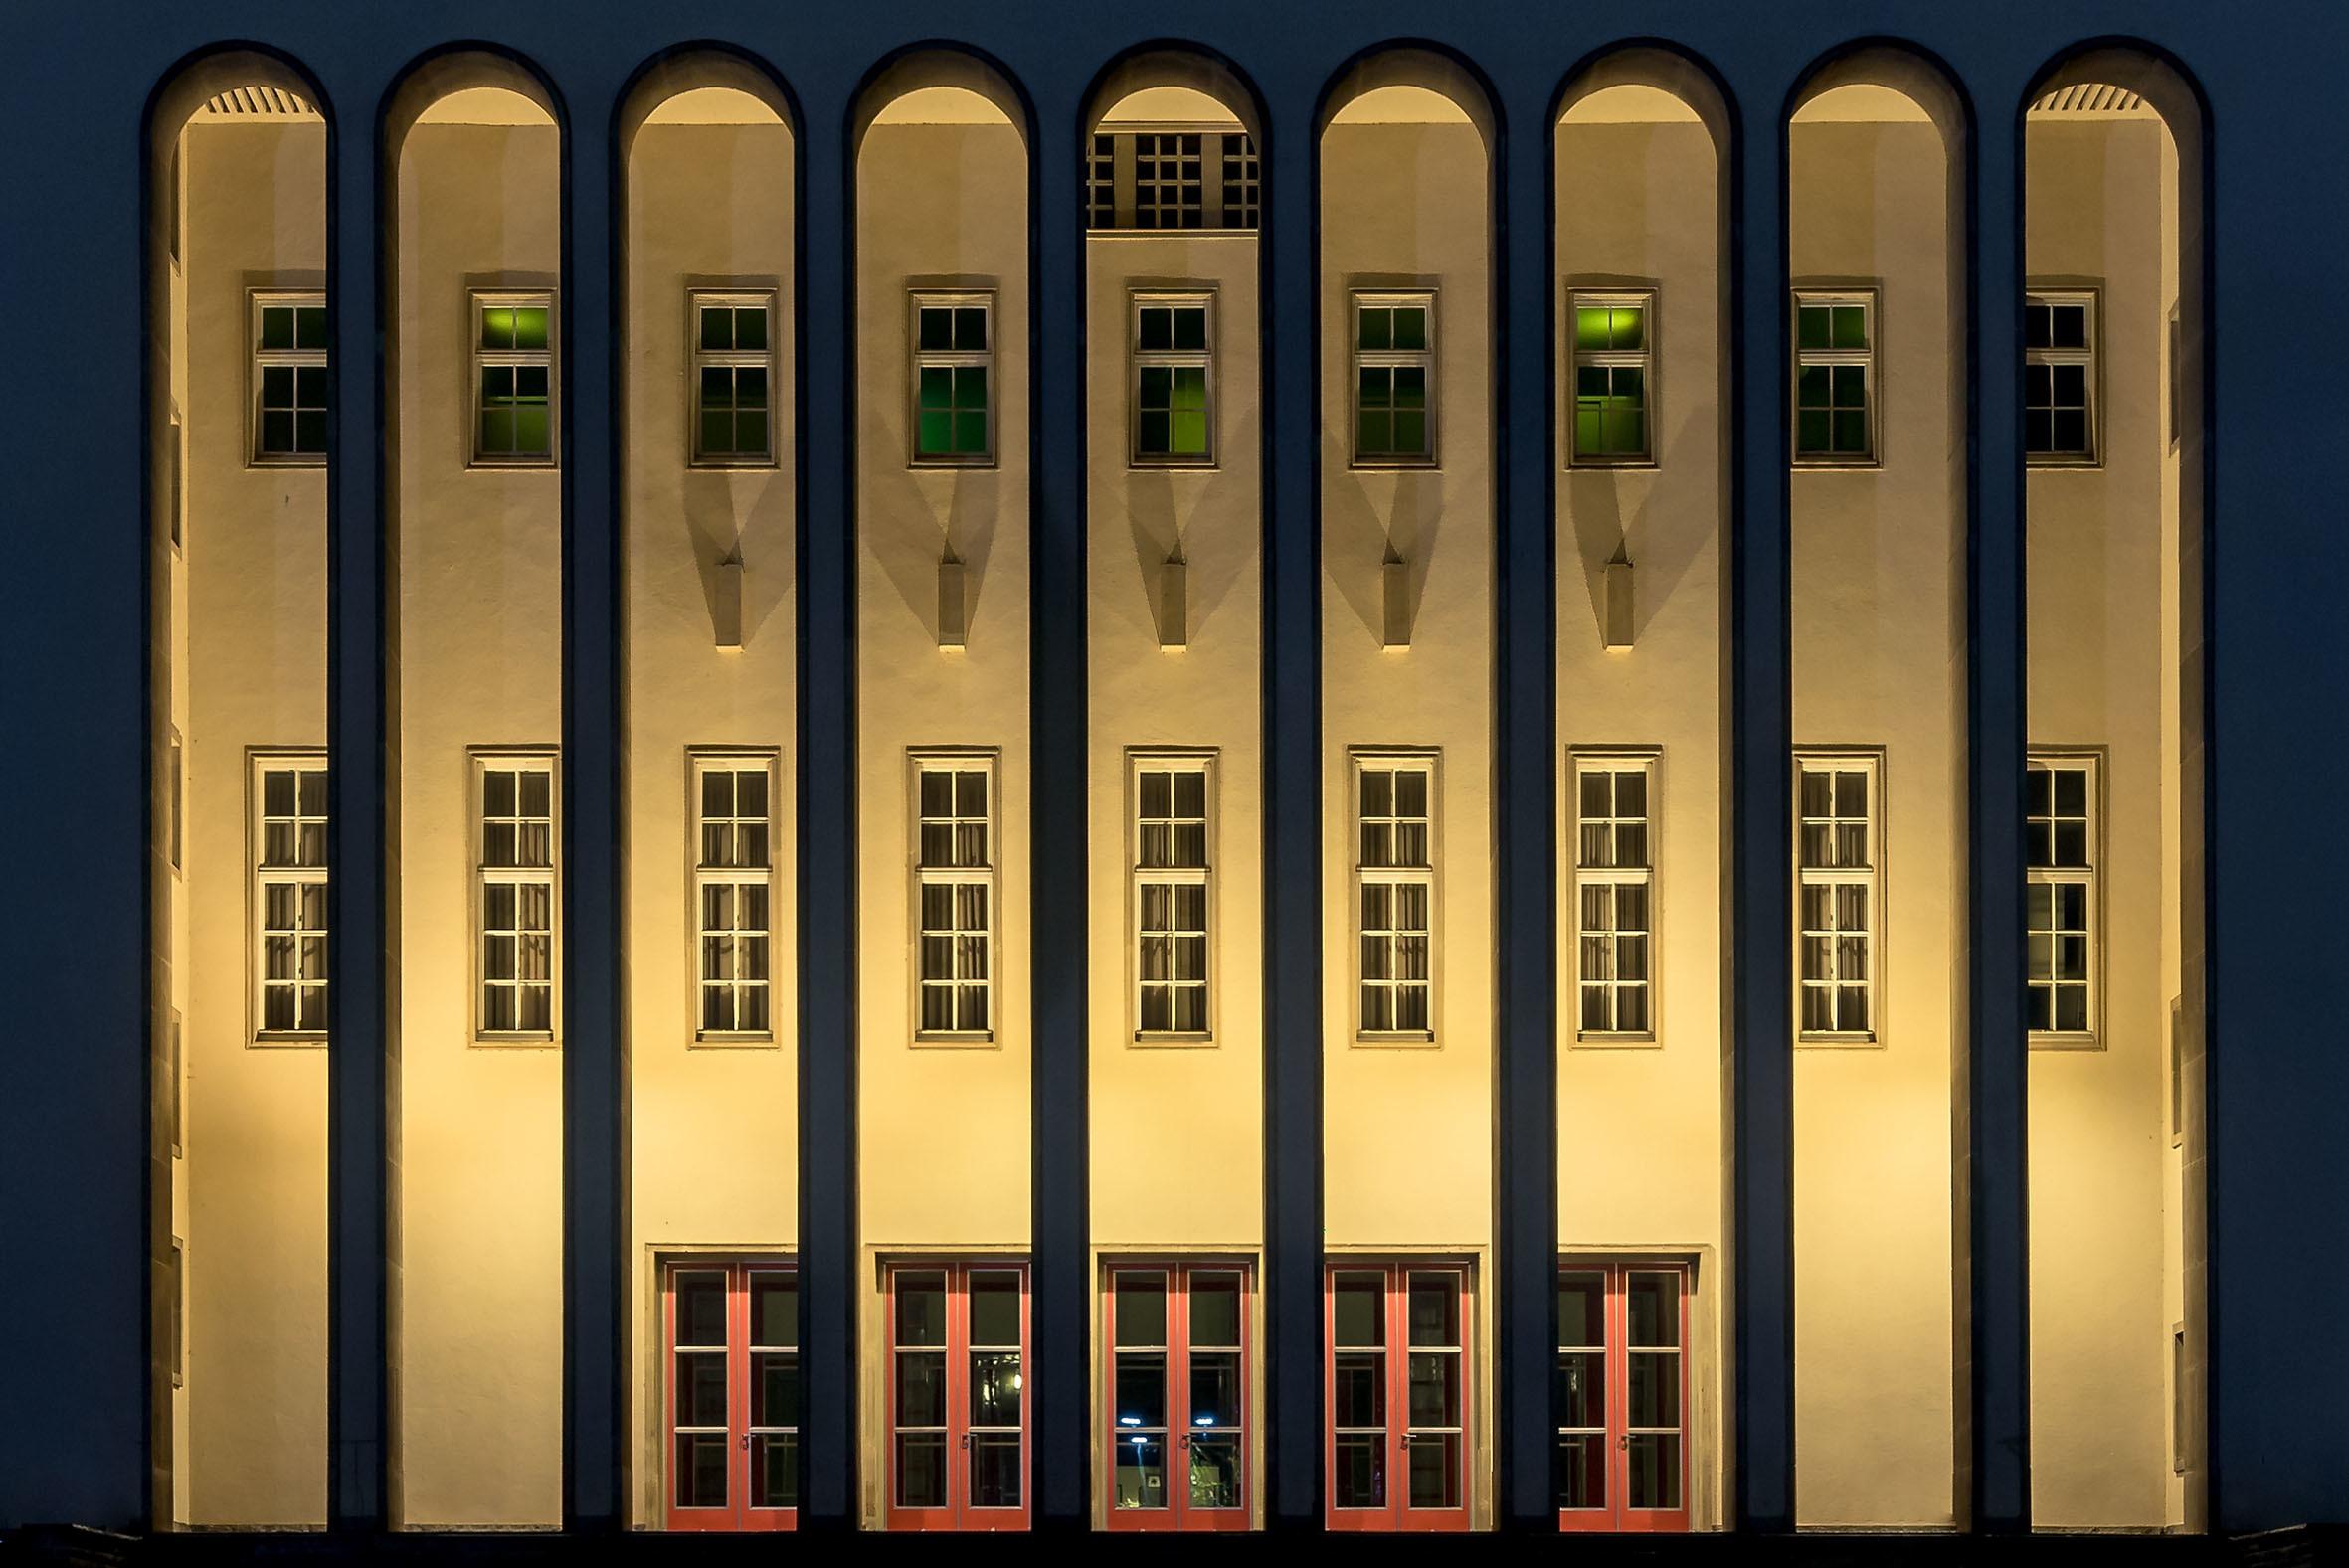 Architekturfotografie Rudolf-Oetker-Halle Bielefeld